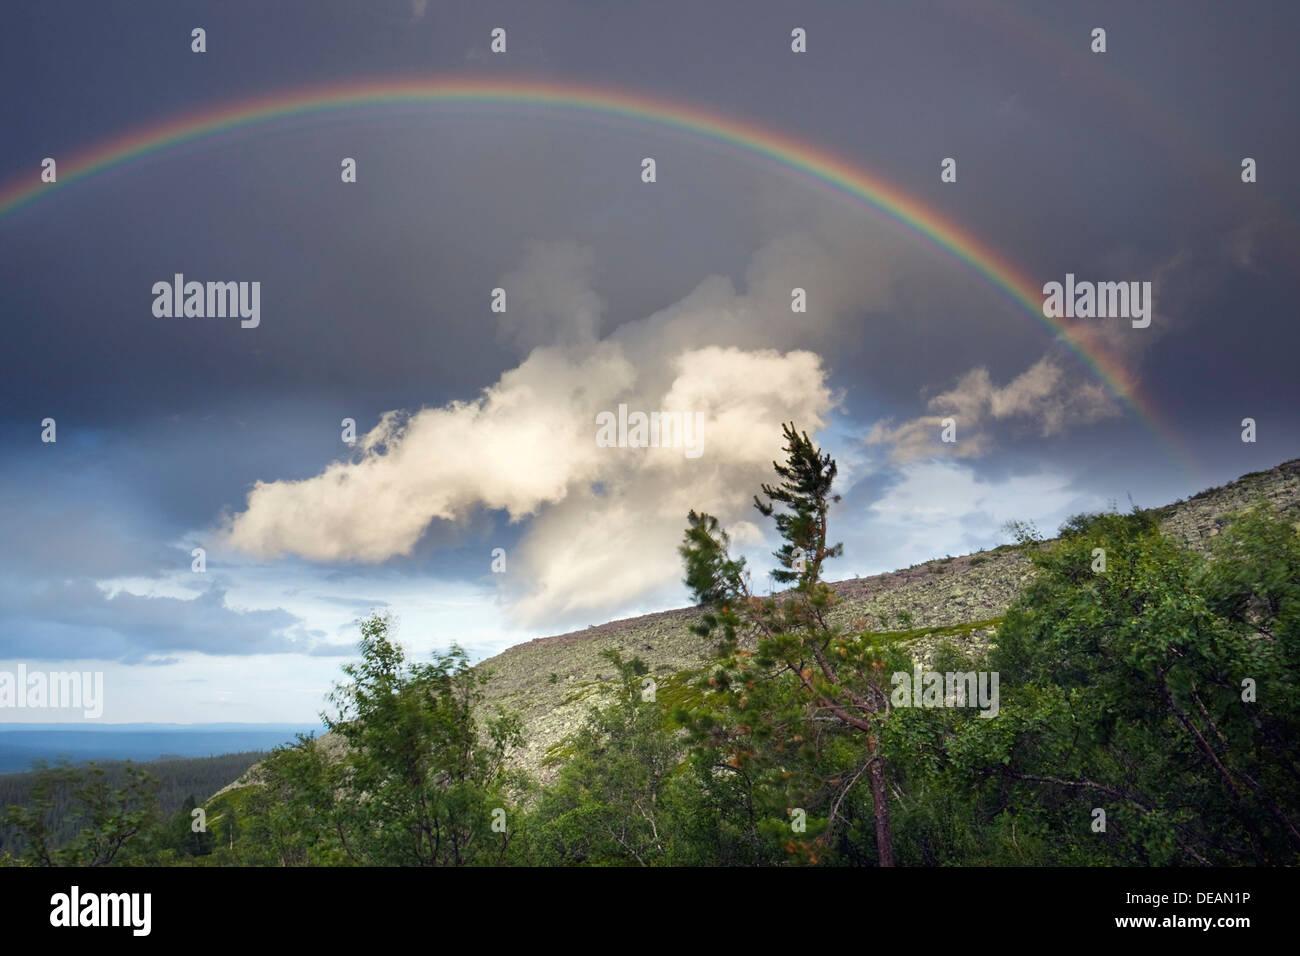 Rainbow, Fulufjaellet National Park, Dalarna county, Sweden, Scandinavia, Europe - Stock Image